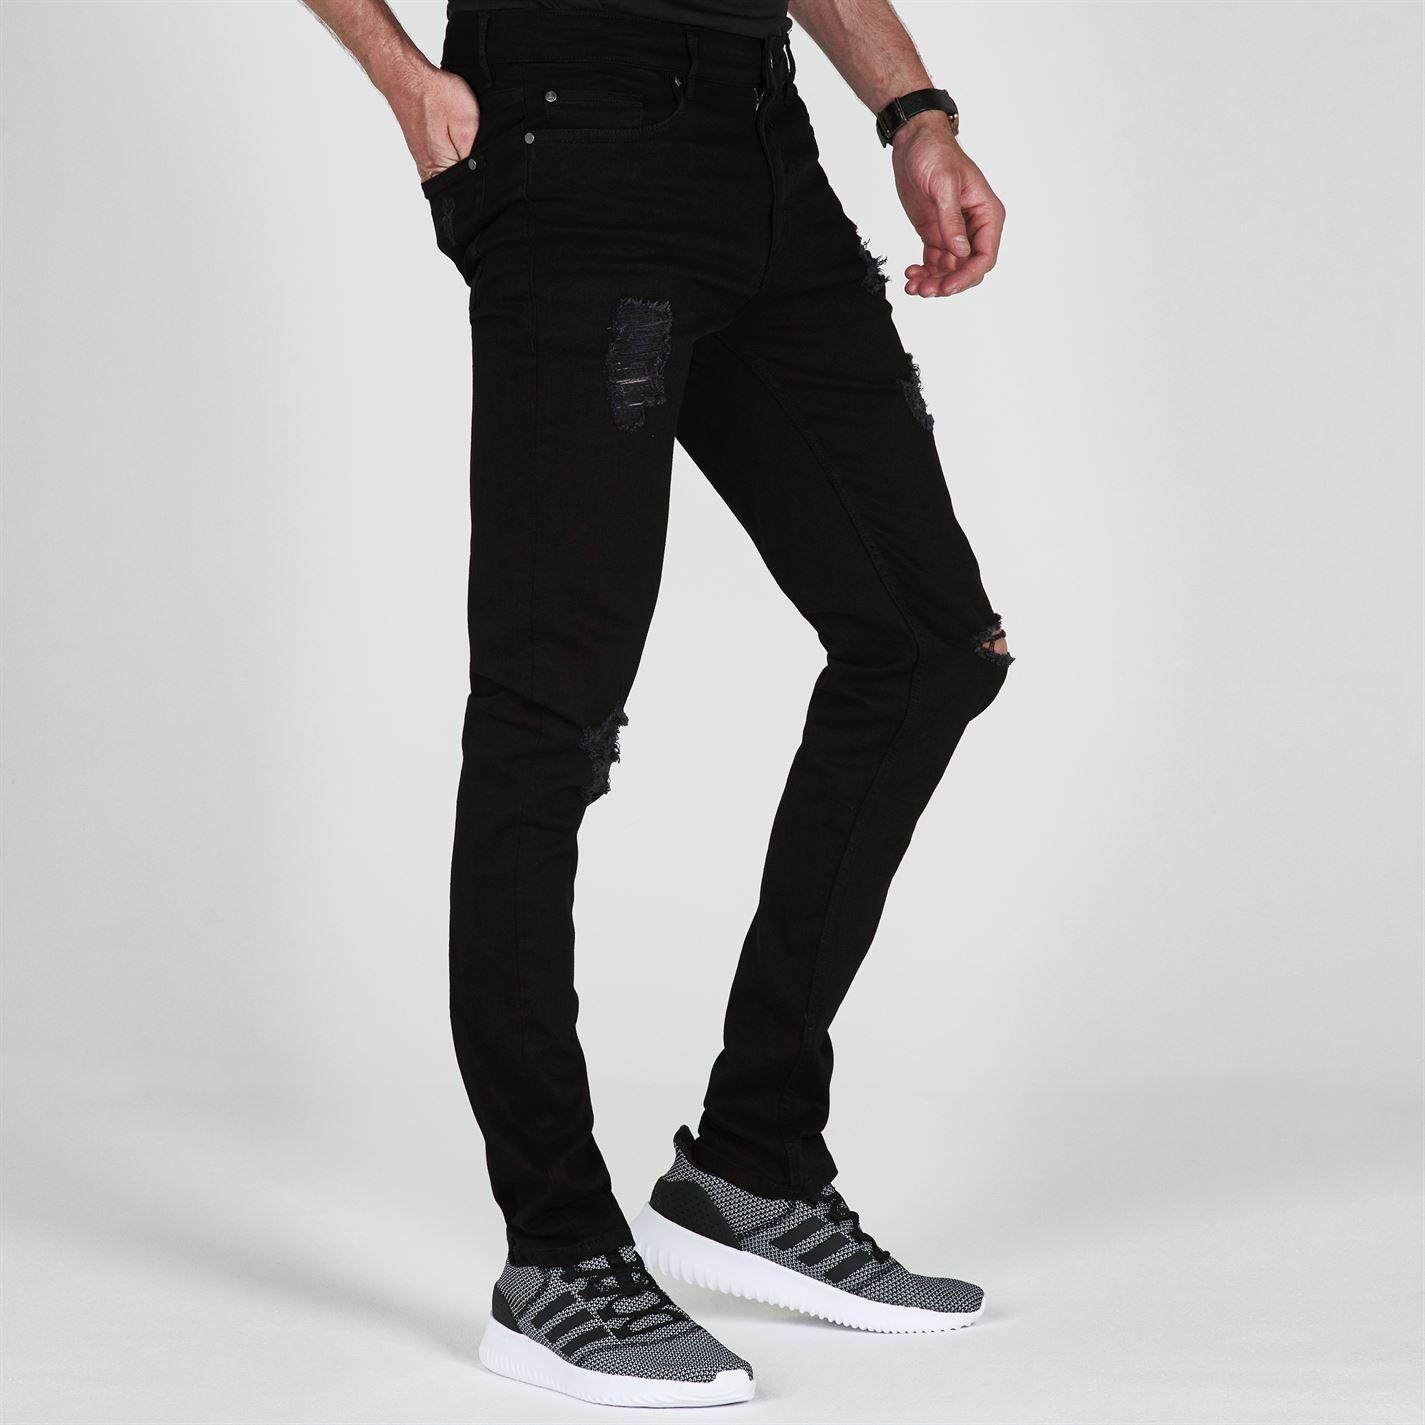 Jeans-Denim-Firetrap-Skinny-Mens-Trouser-Pants-Black thumbnail 12